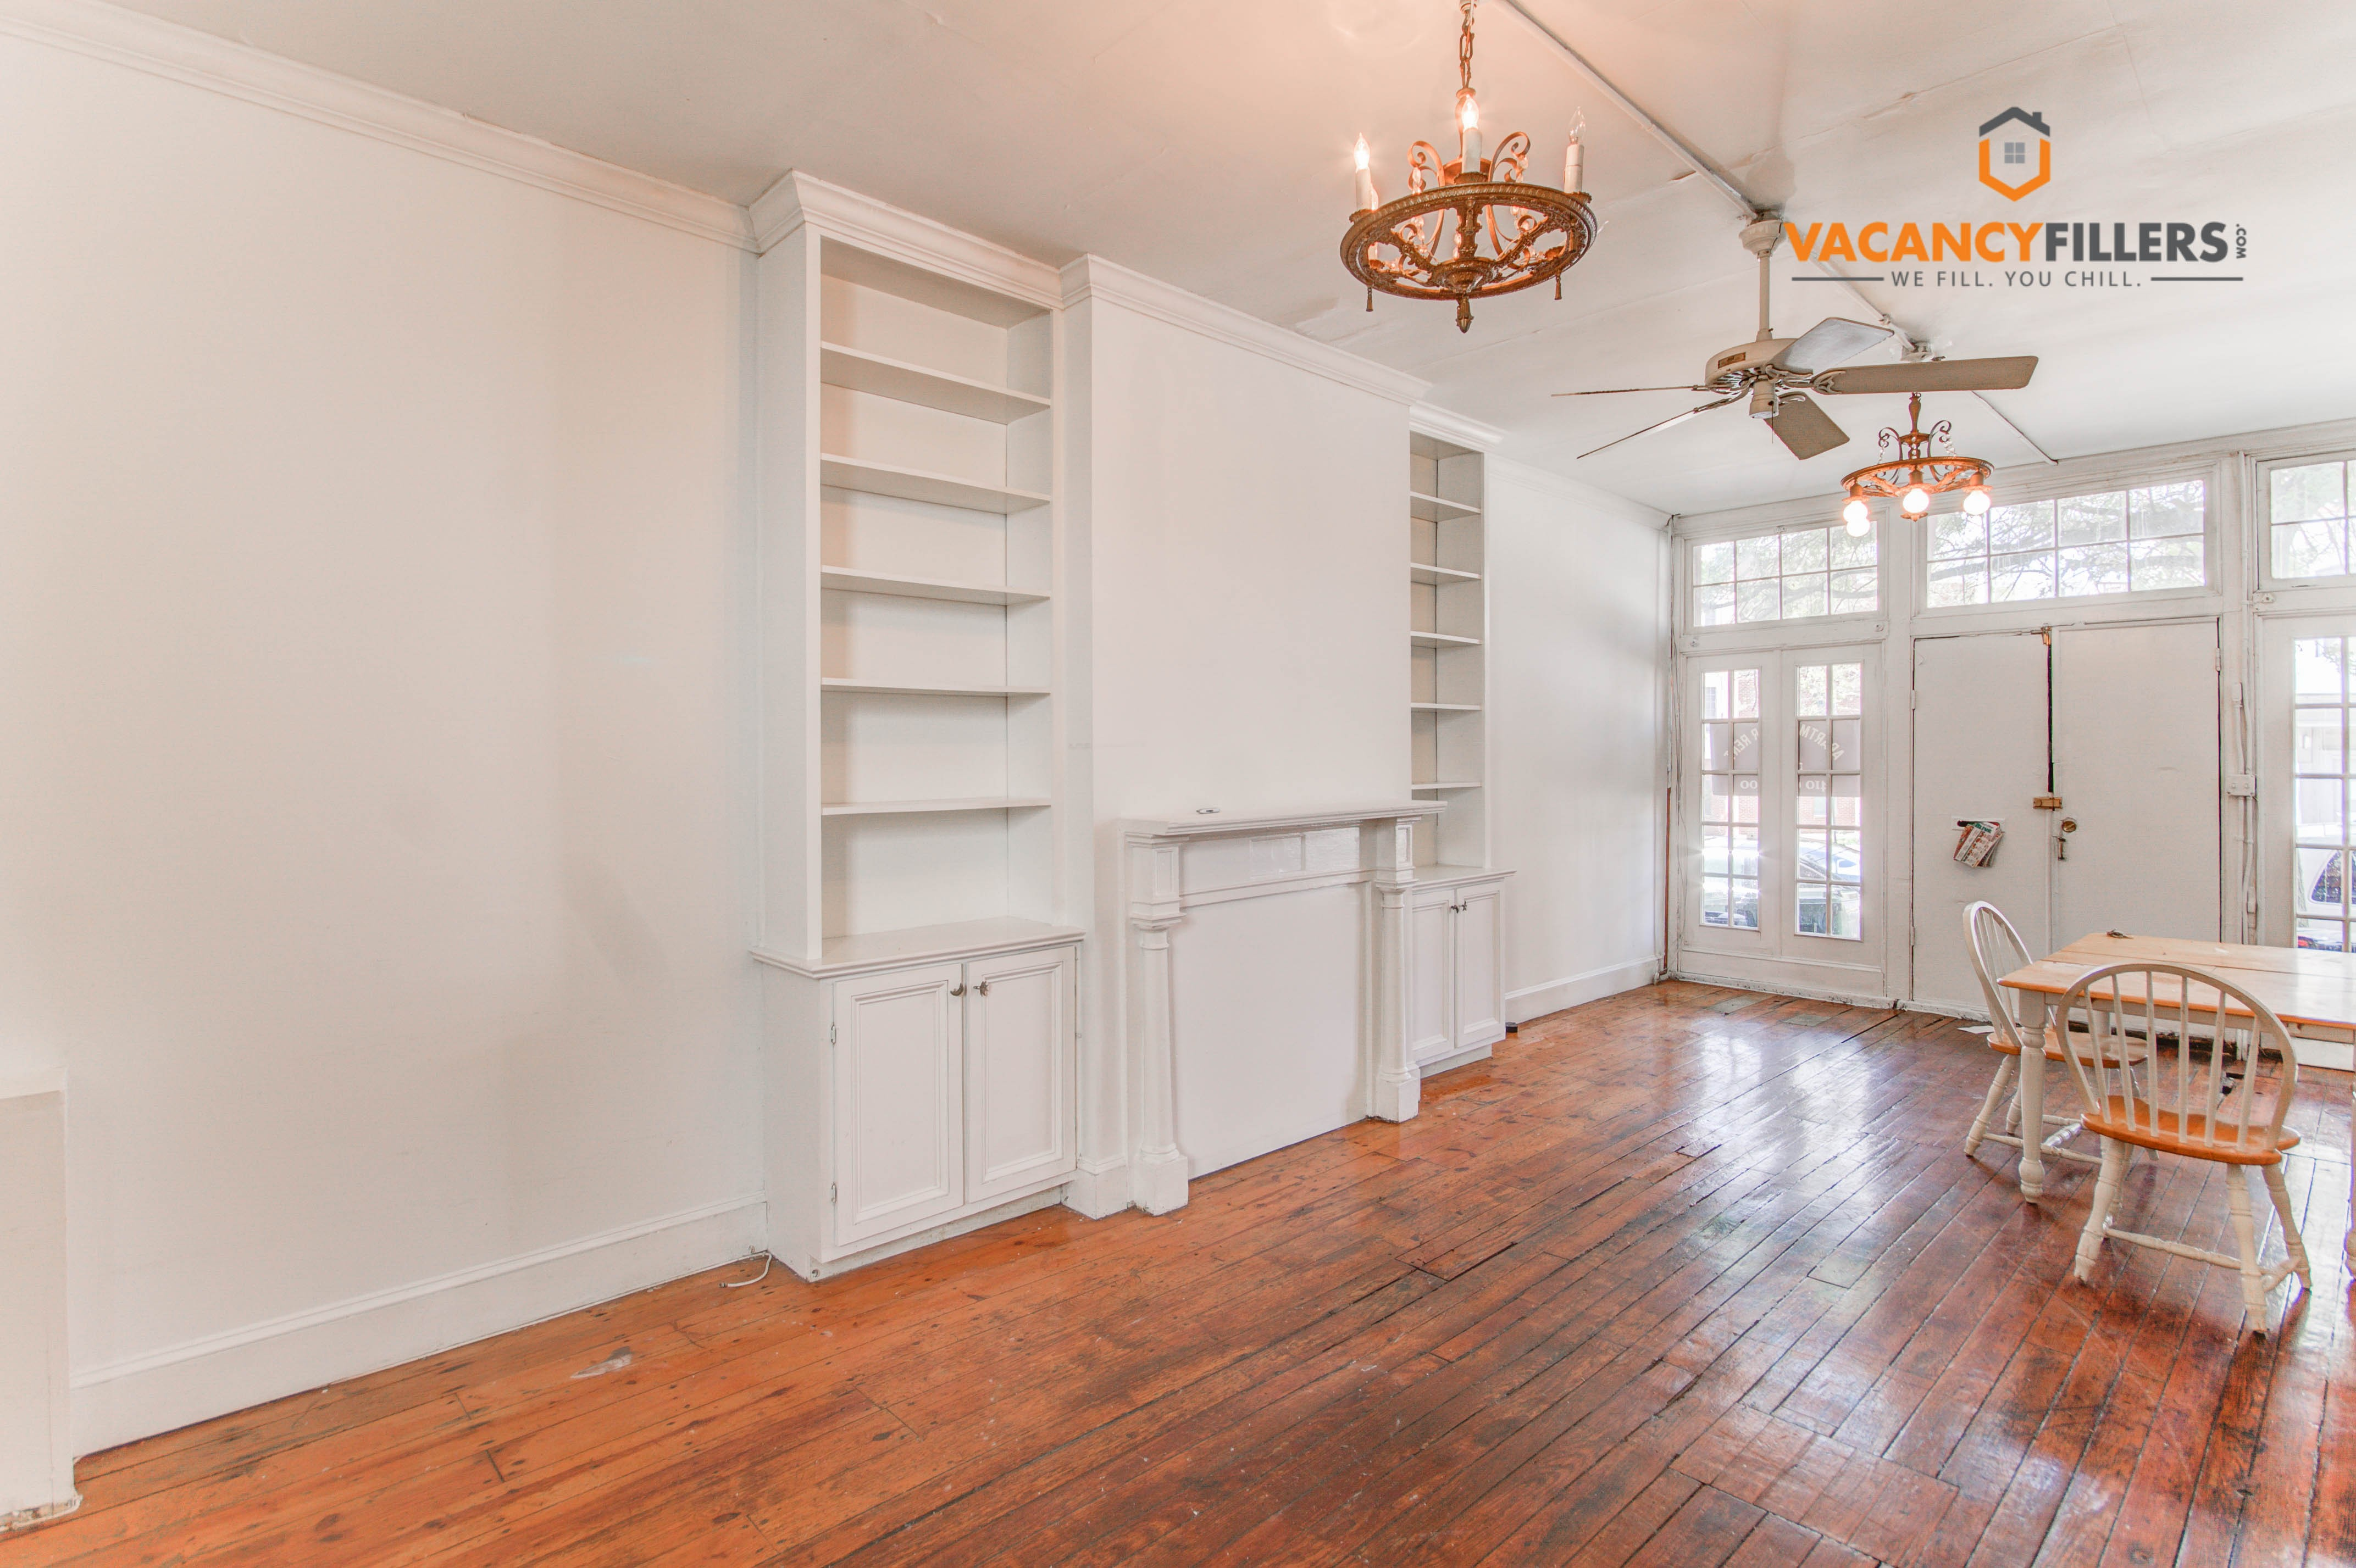 st 1 baltimore md 21231 1 bedroom apartment for rent padmapper